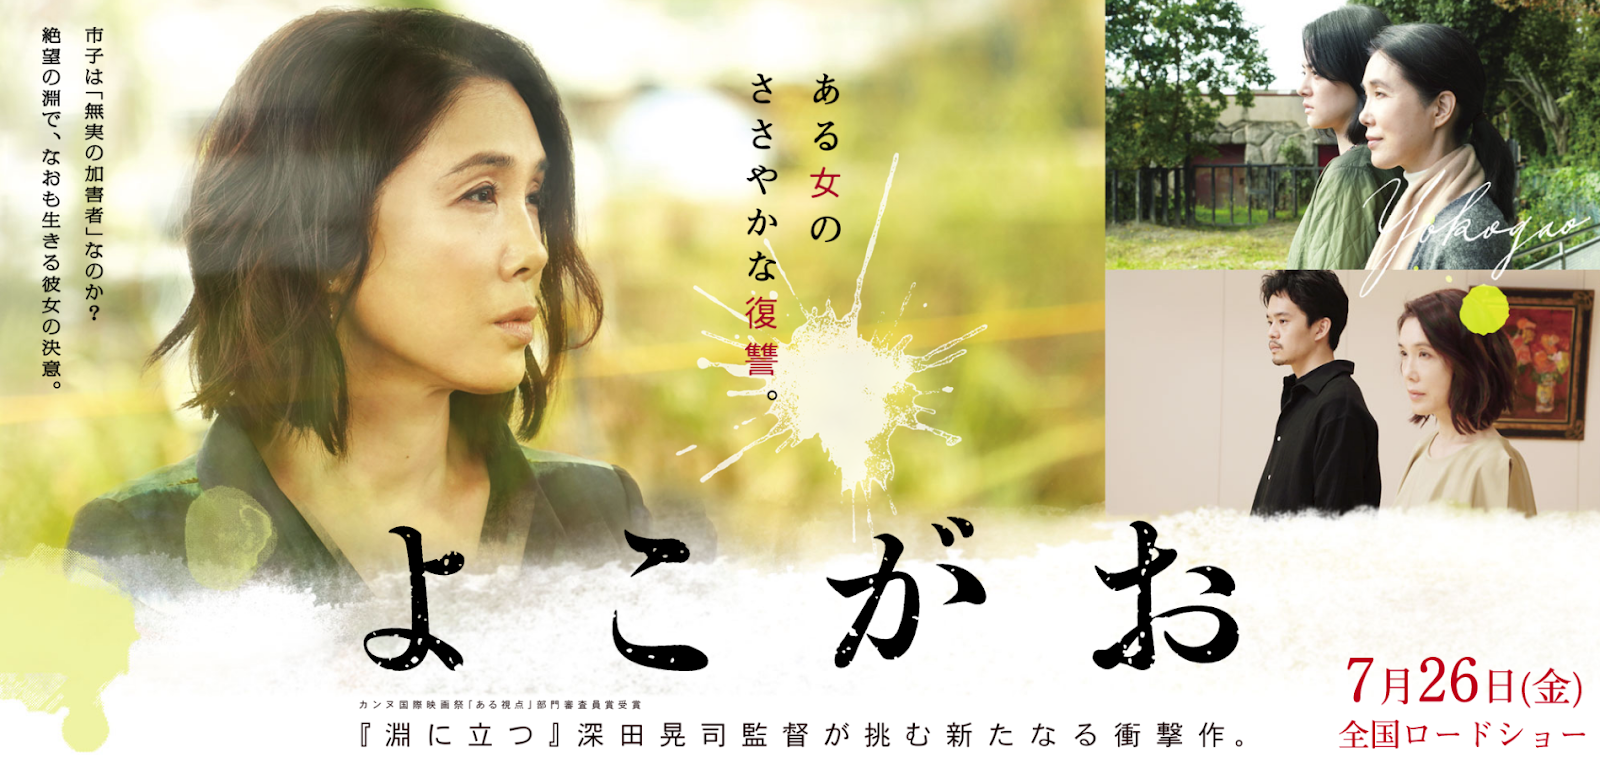 Koji Fukada - A Girl Missing